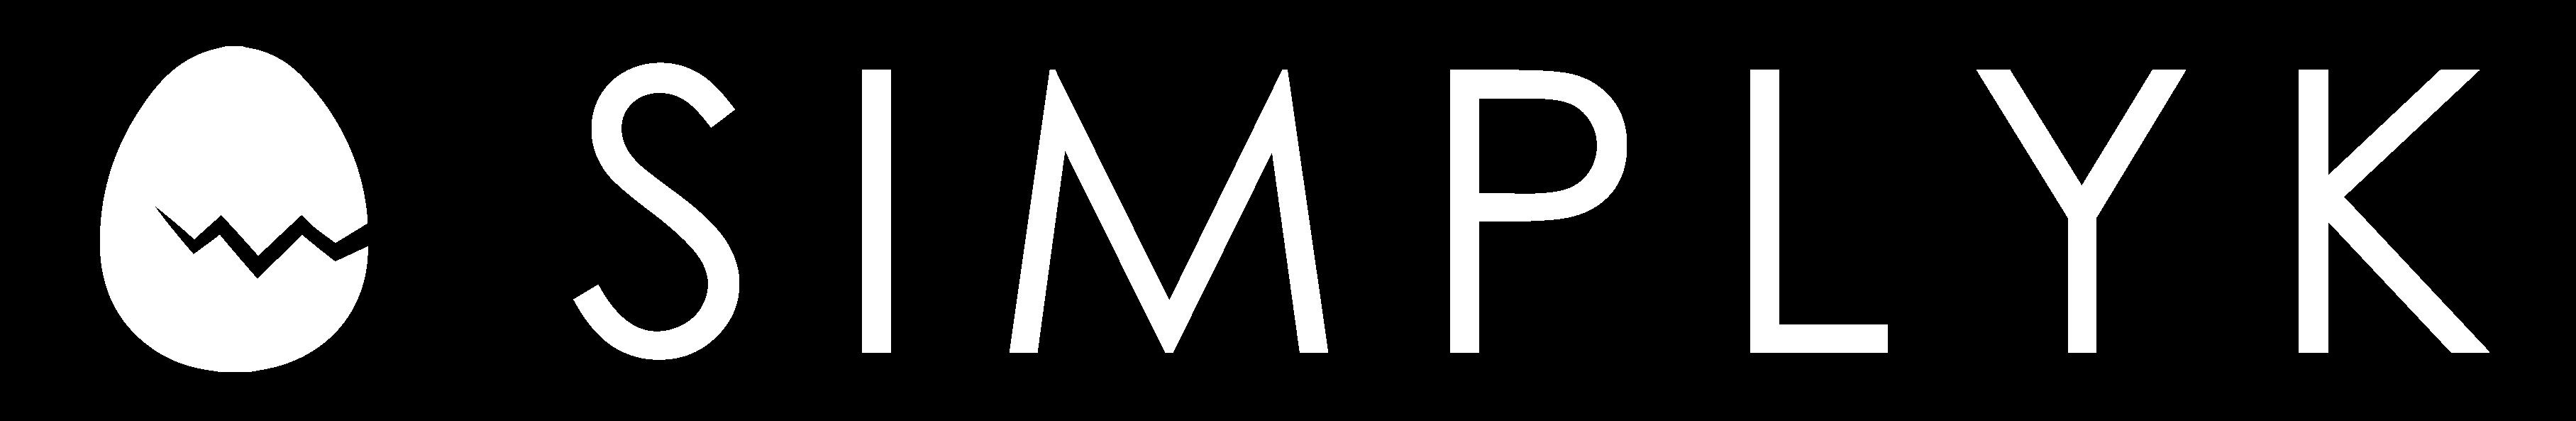 forum pour rencontre ado south frontenac